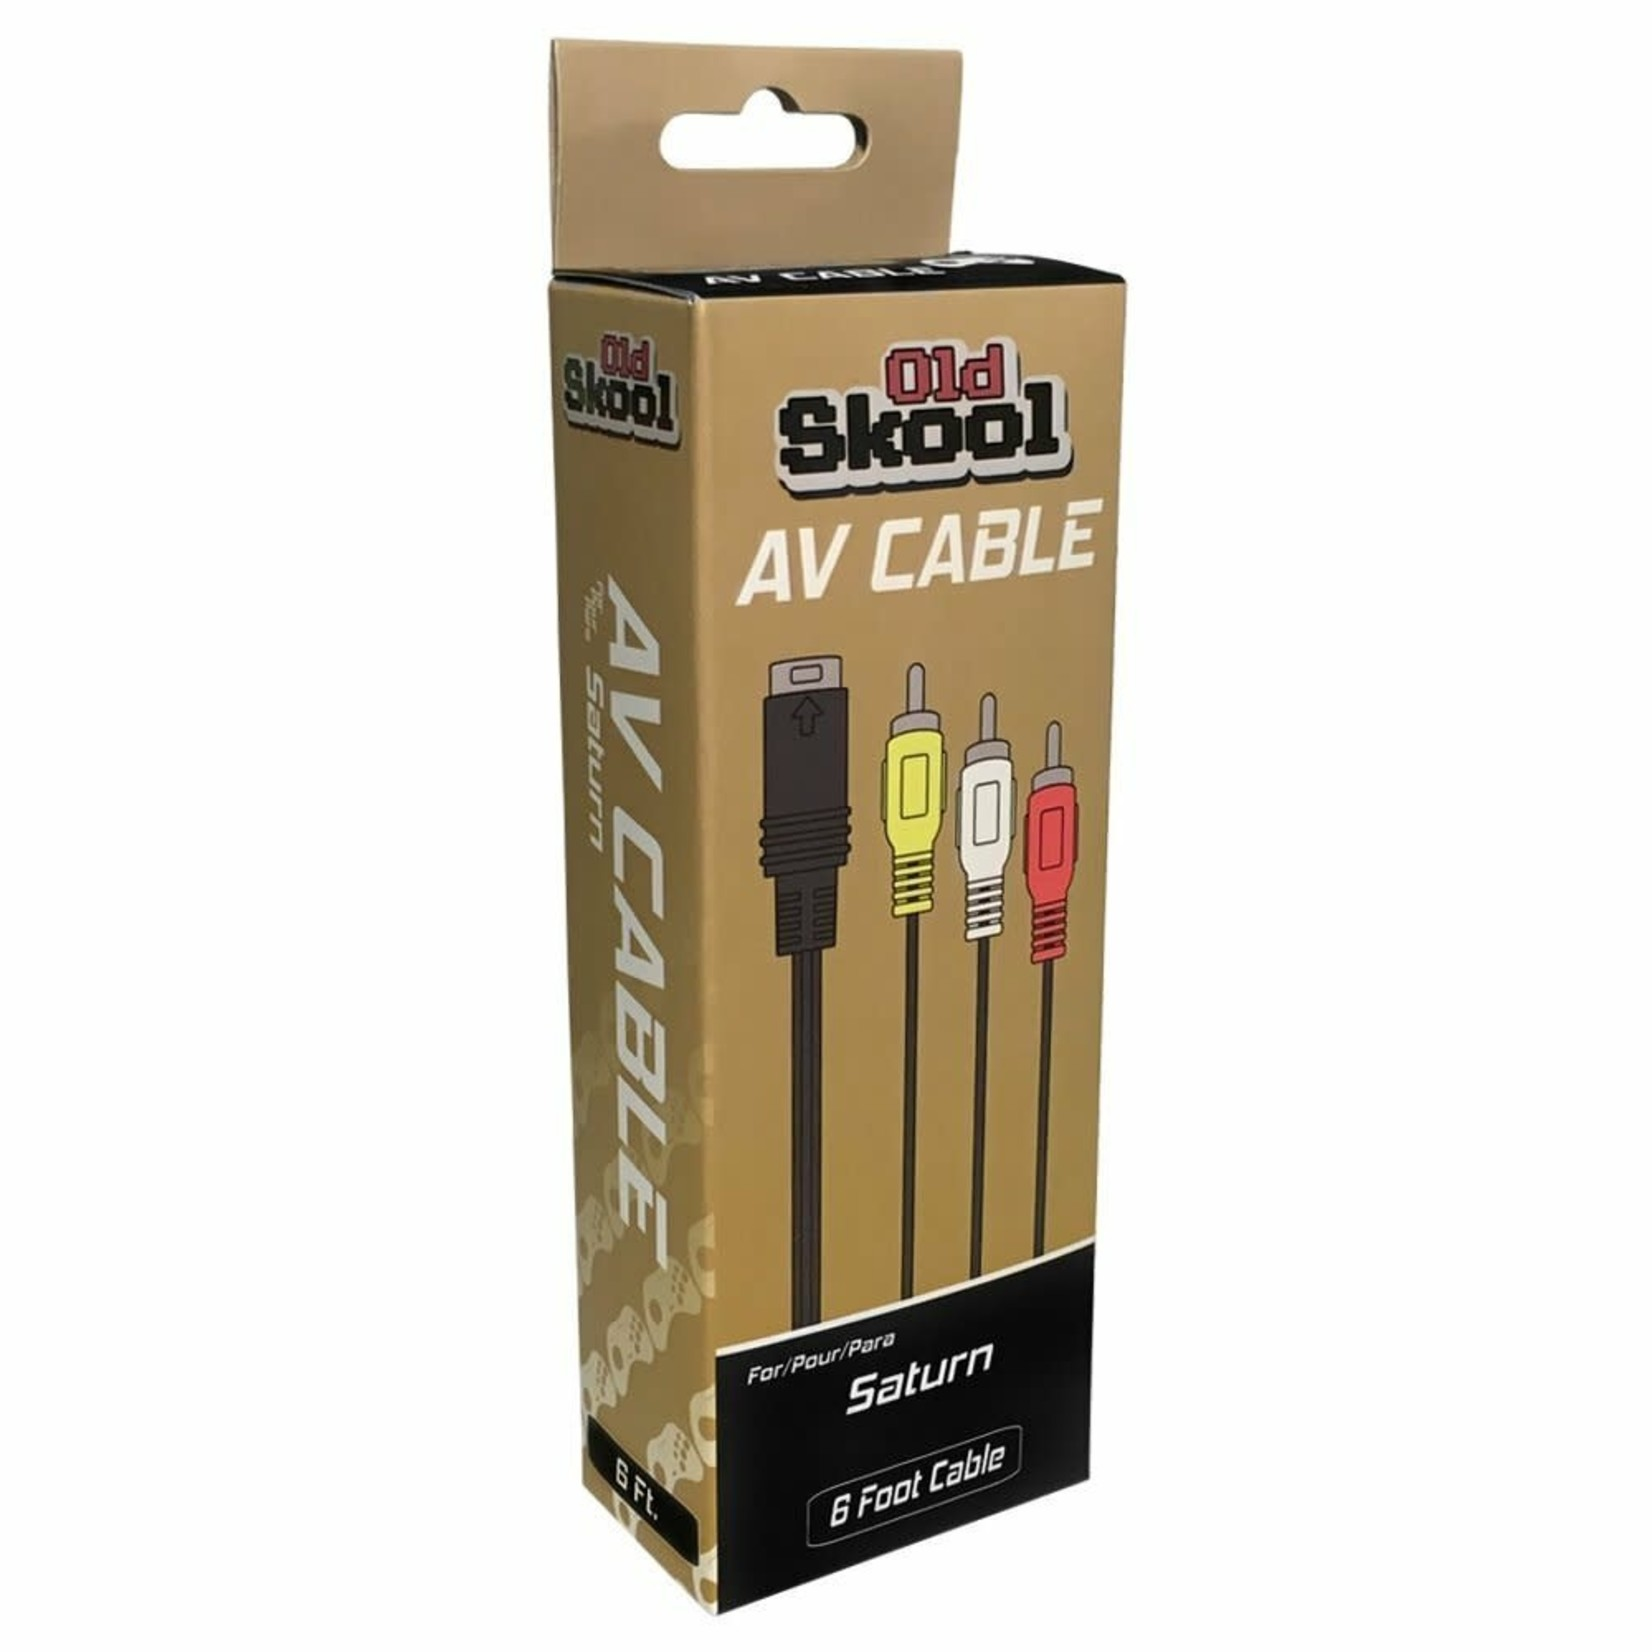 Old Skool AV cable for Sega Saturn